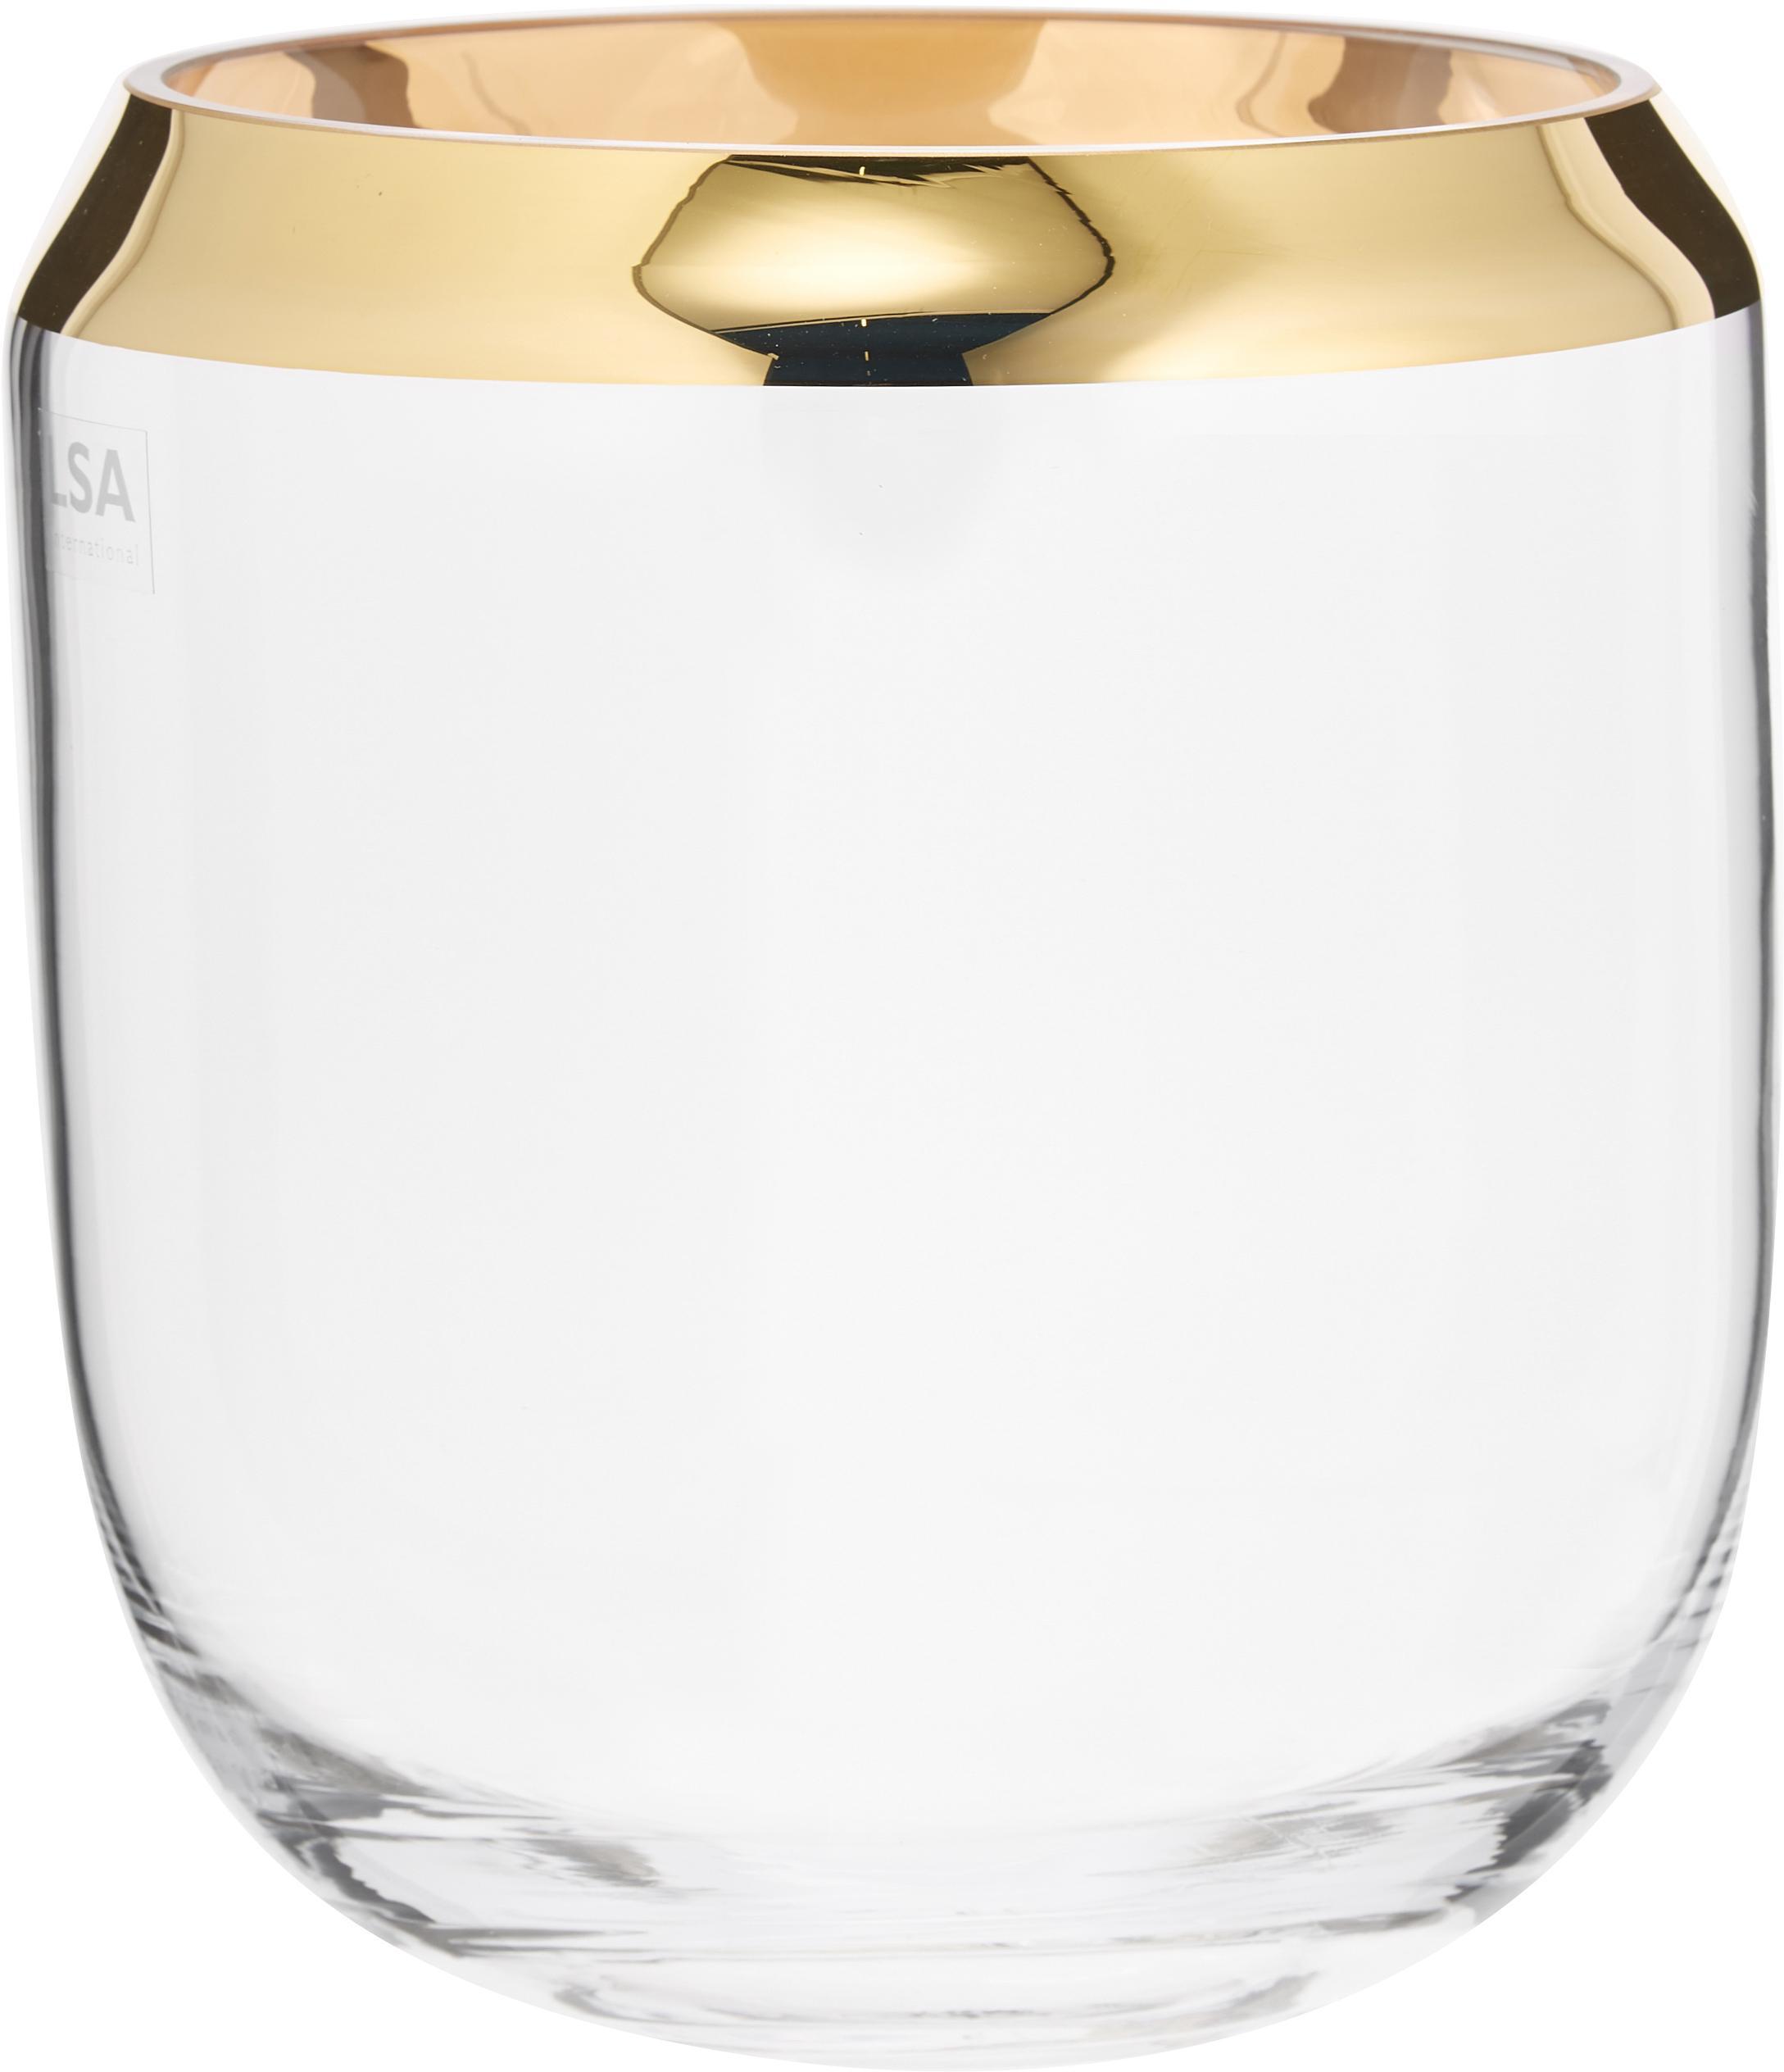 Vaso soffiato Space, Vetro, Trasparente, dorato, Ø 18 x Alt. 20 cm